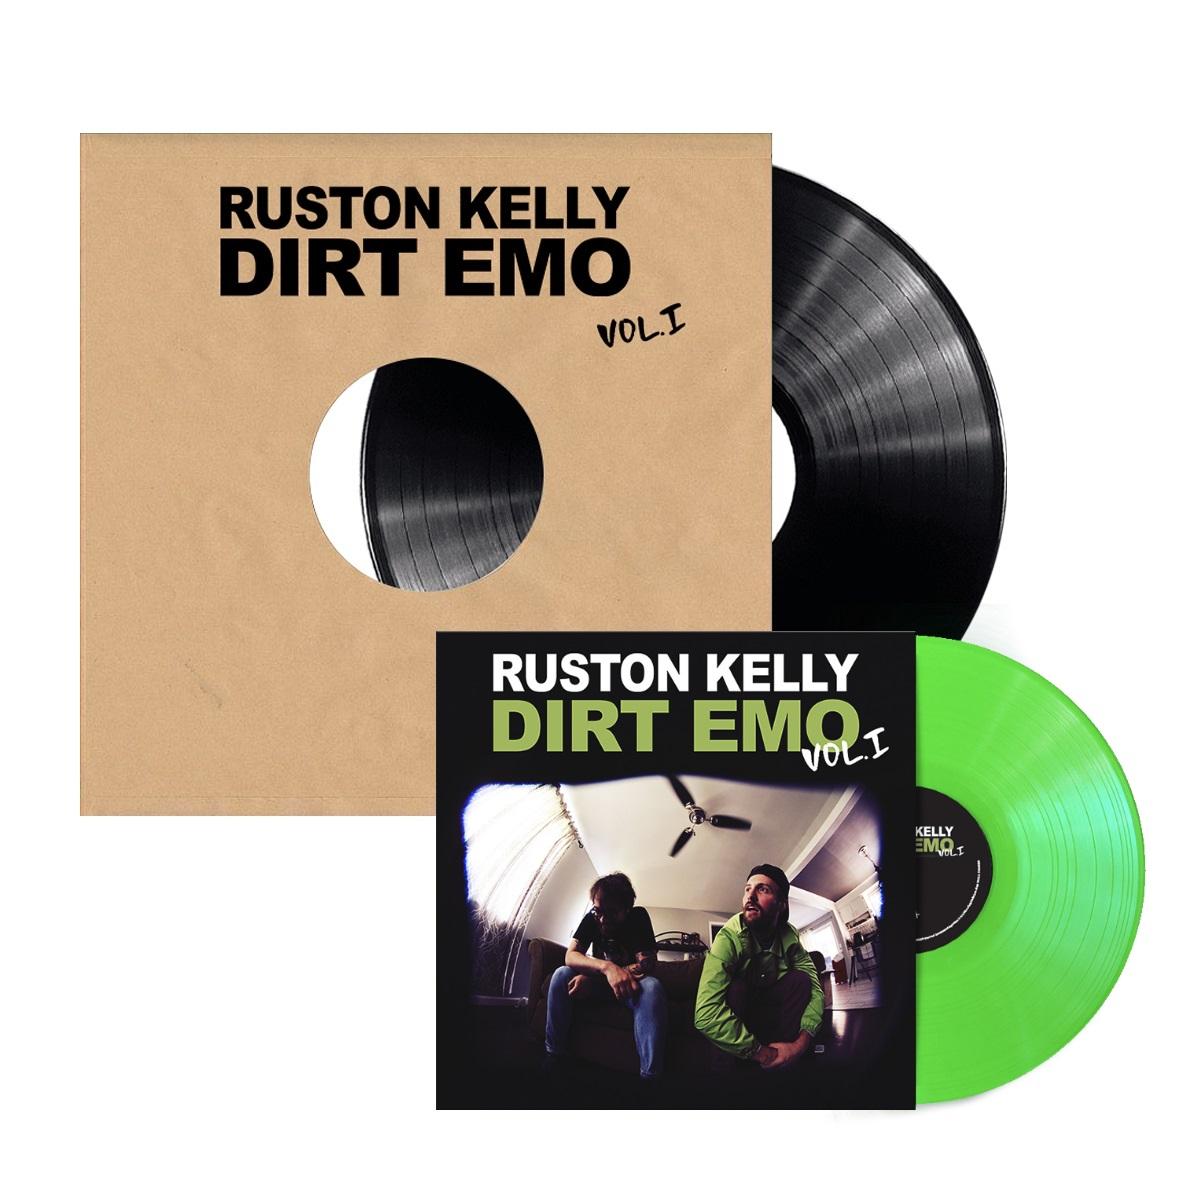 Signed Dirt Emo Vol. 1 Test Pressing + Neon Green Dirt Emo Vol. 1 Vinyl Bundle